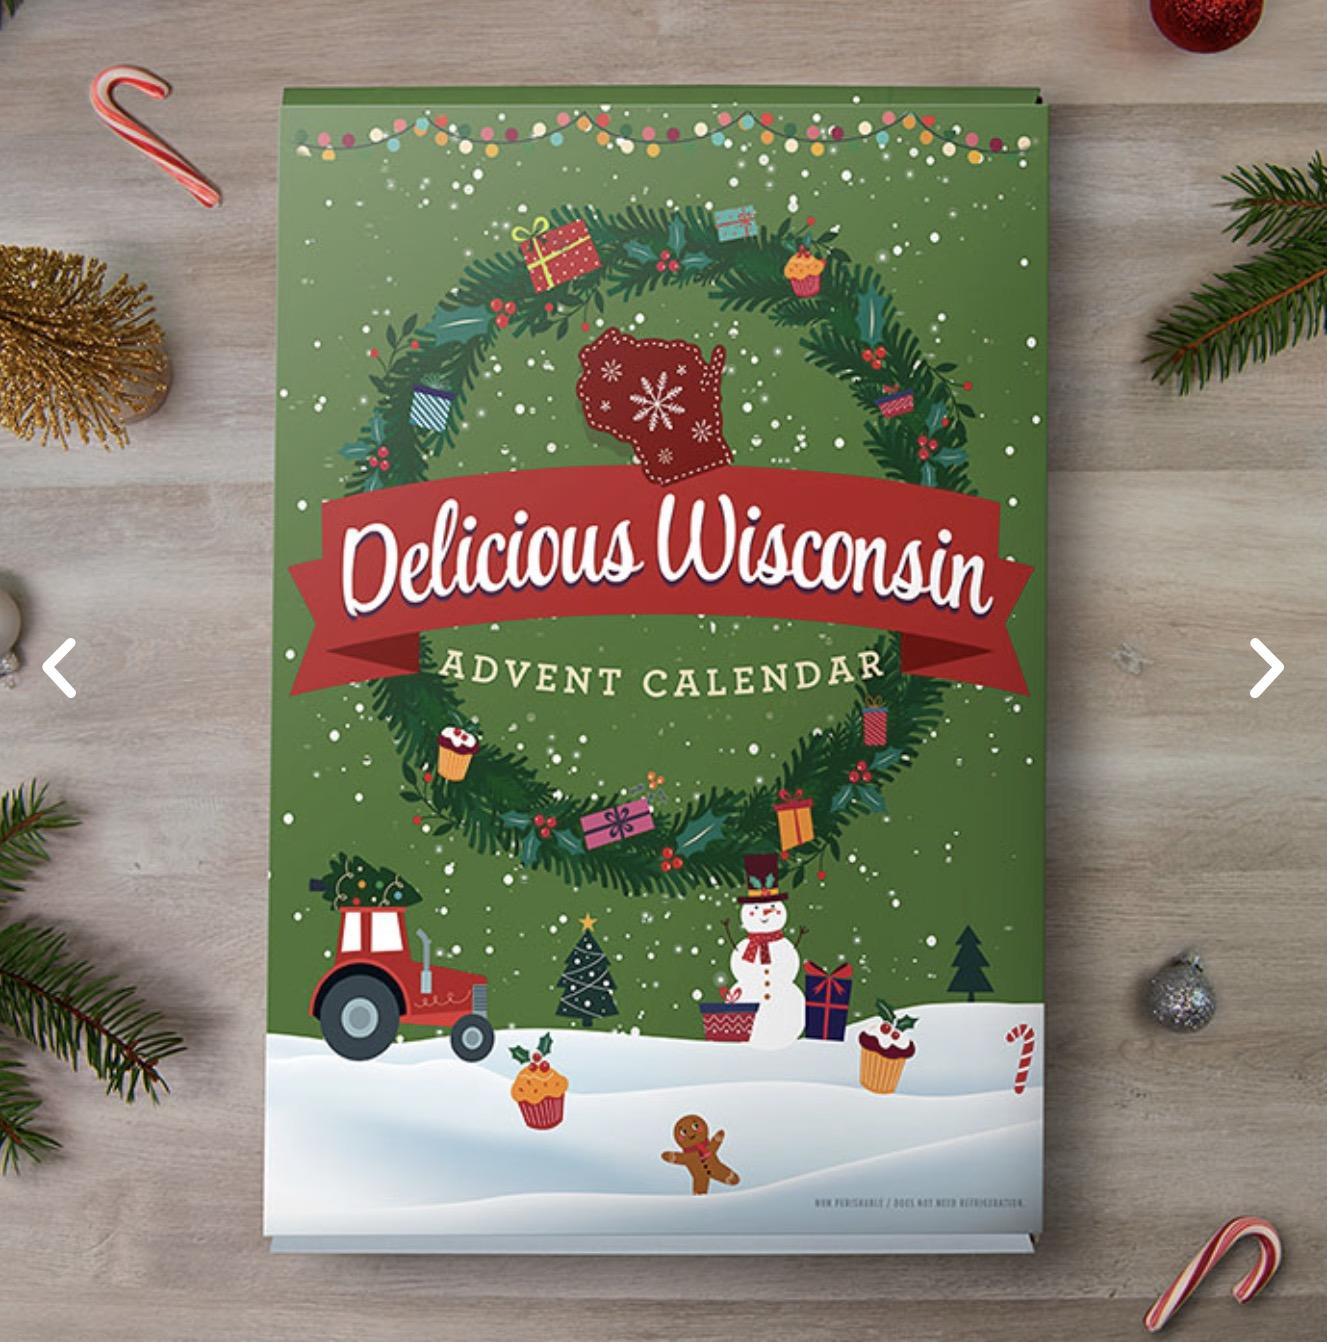 Delicious WISCONSIN Advent Calendar